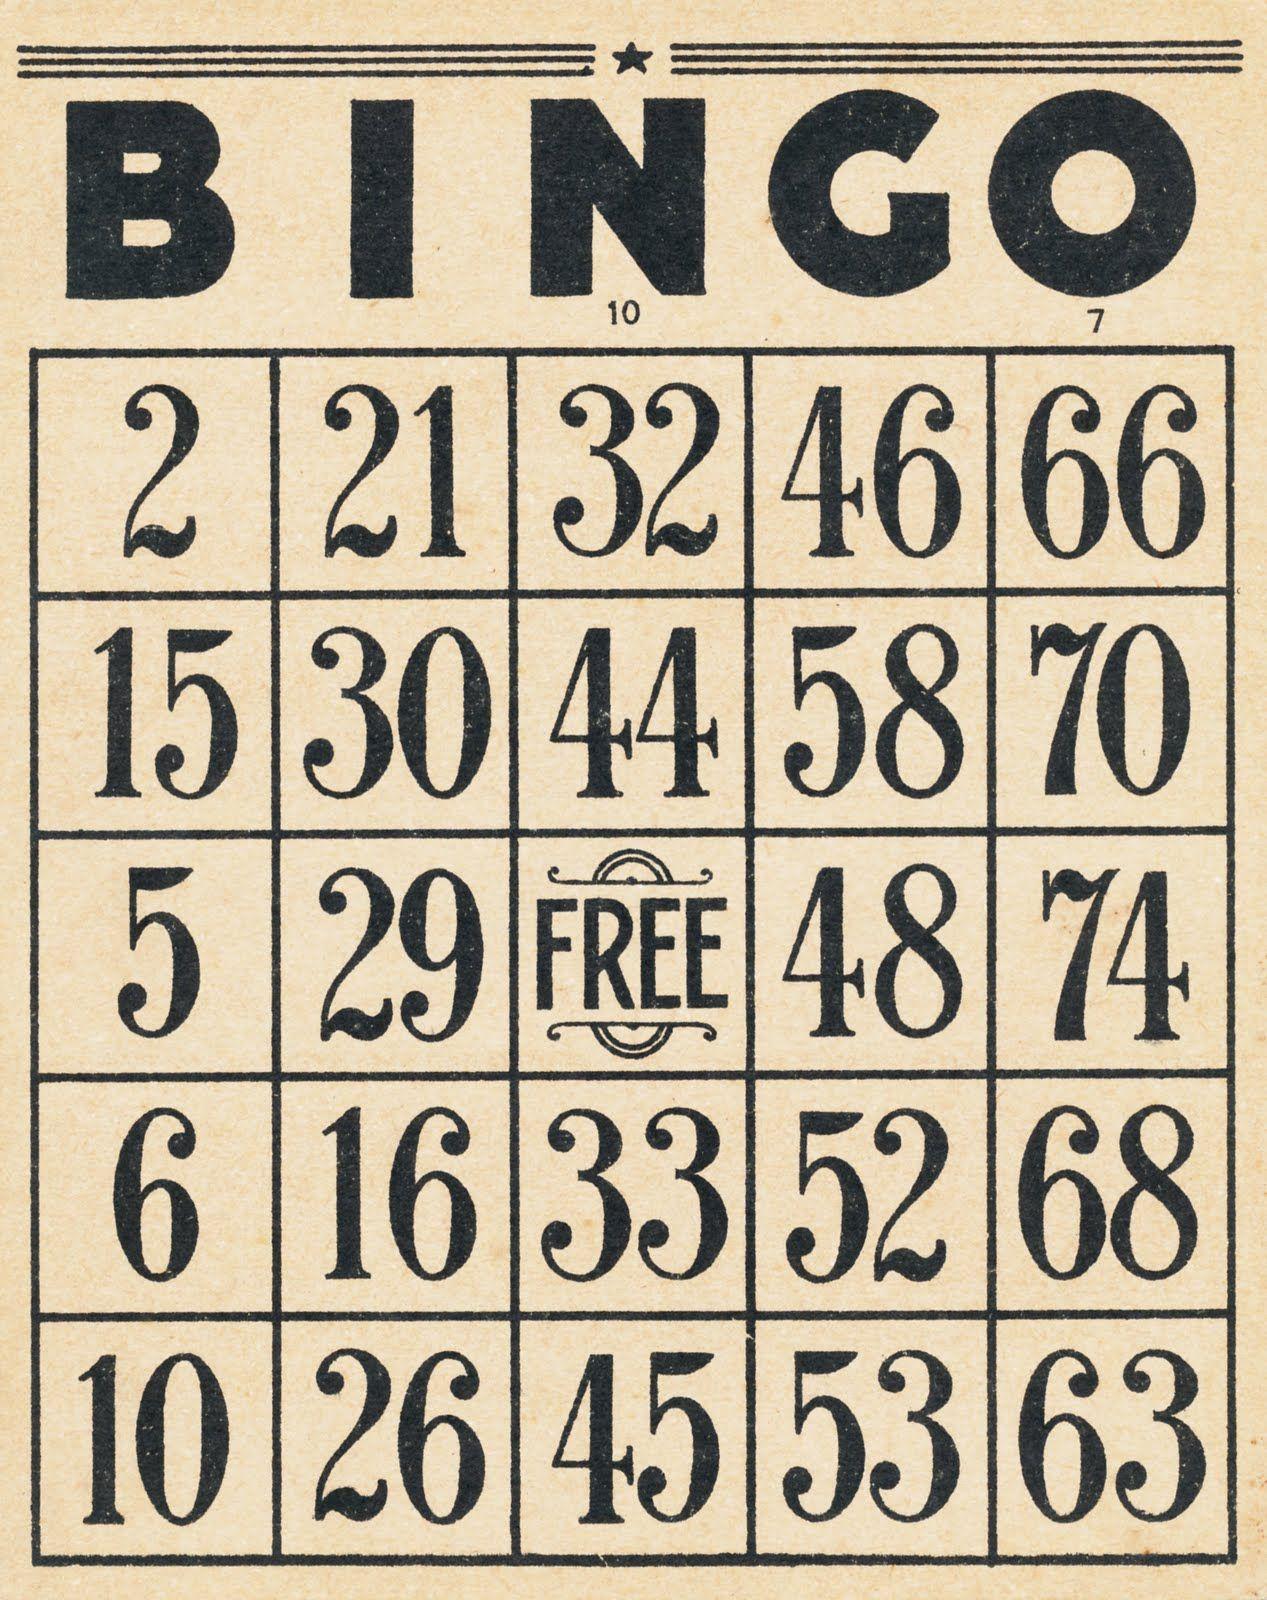 Vintage Bingo Cards And 10-Cent Tickets | Vintage Printables